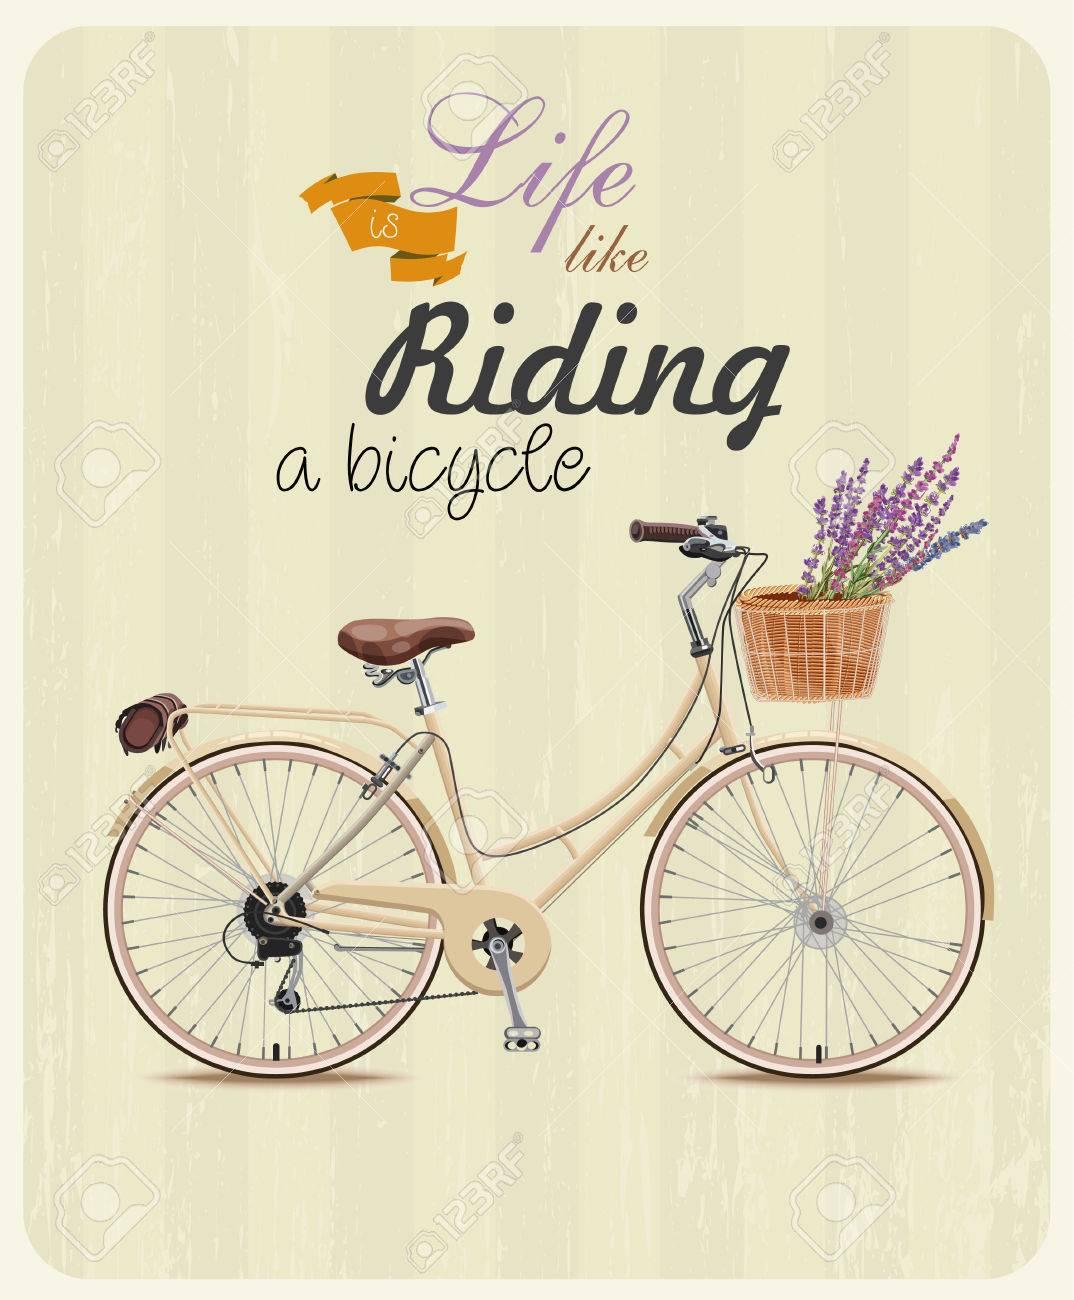 bike riding clipart.html